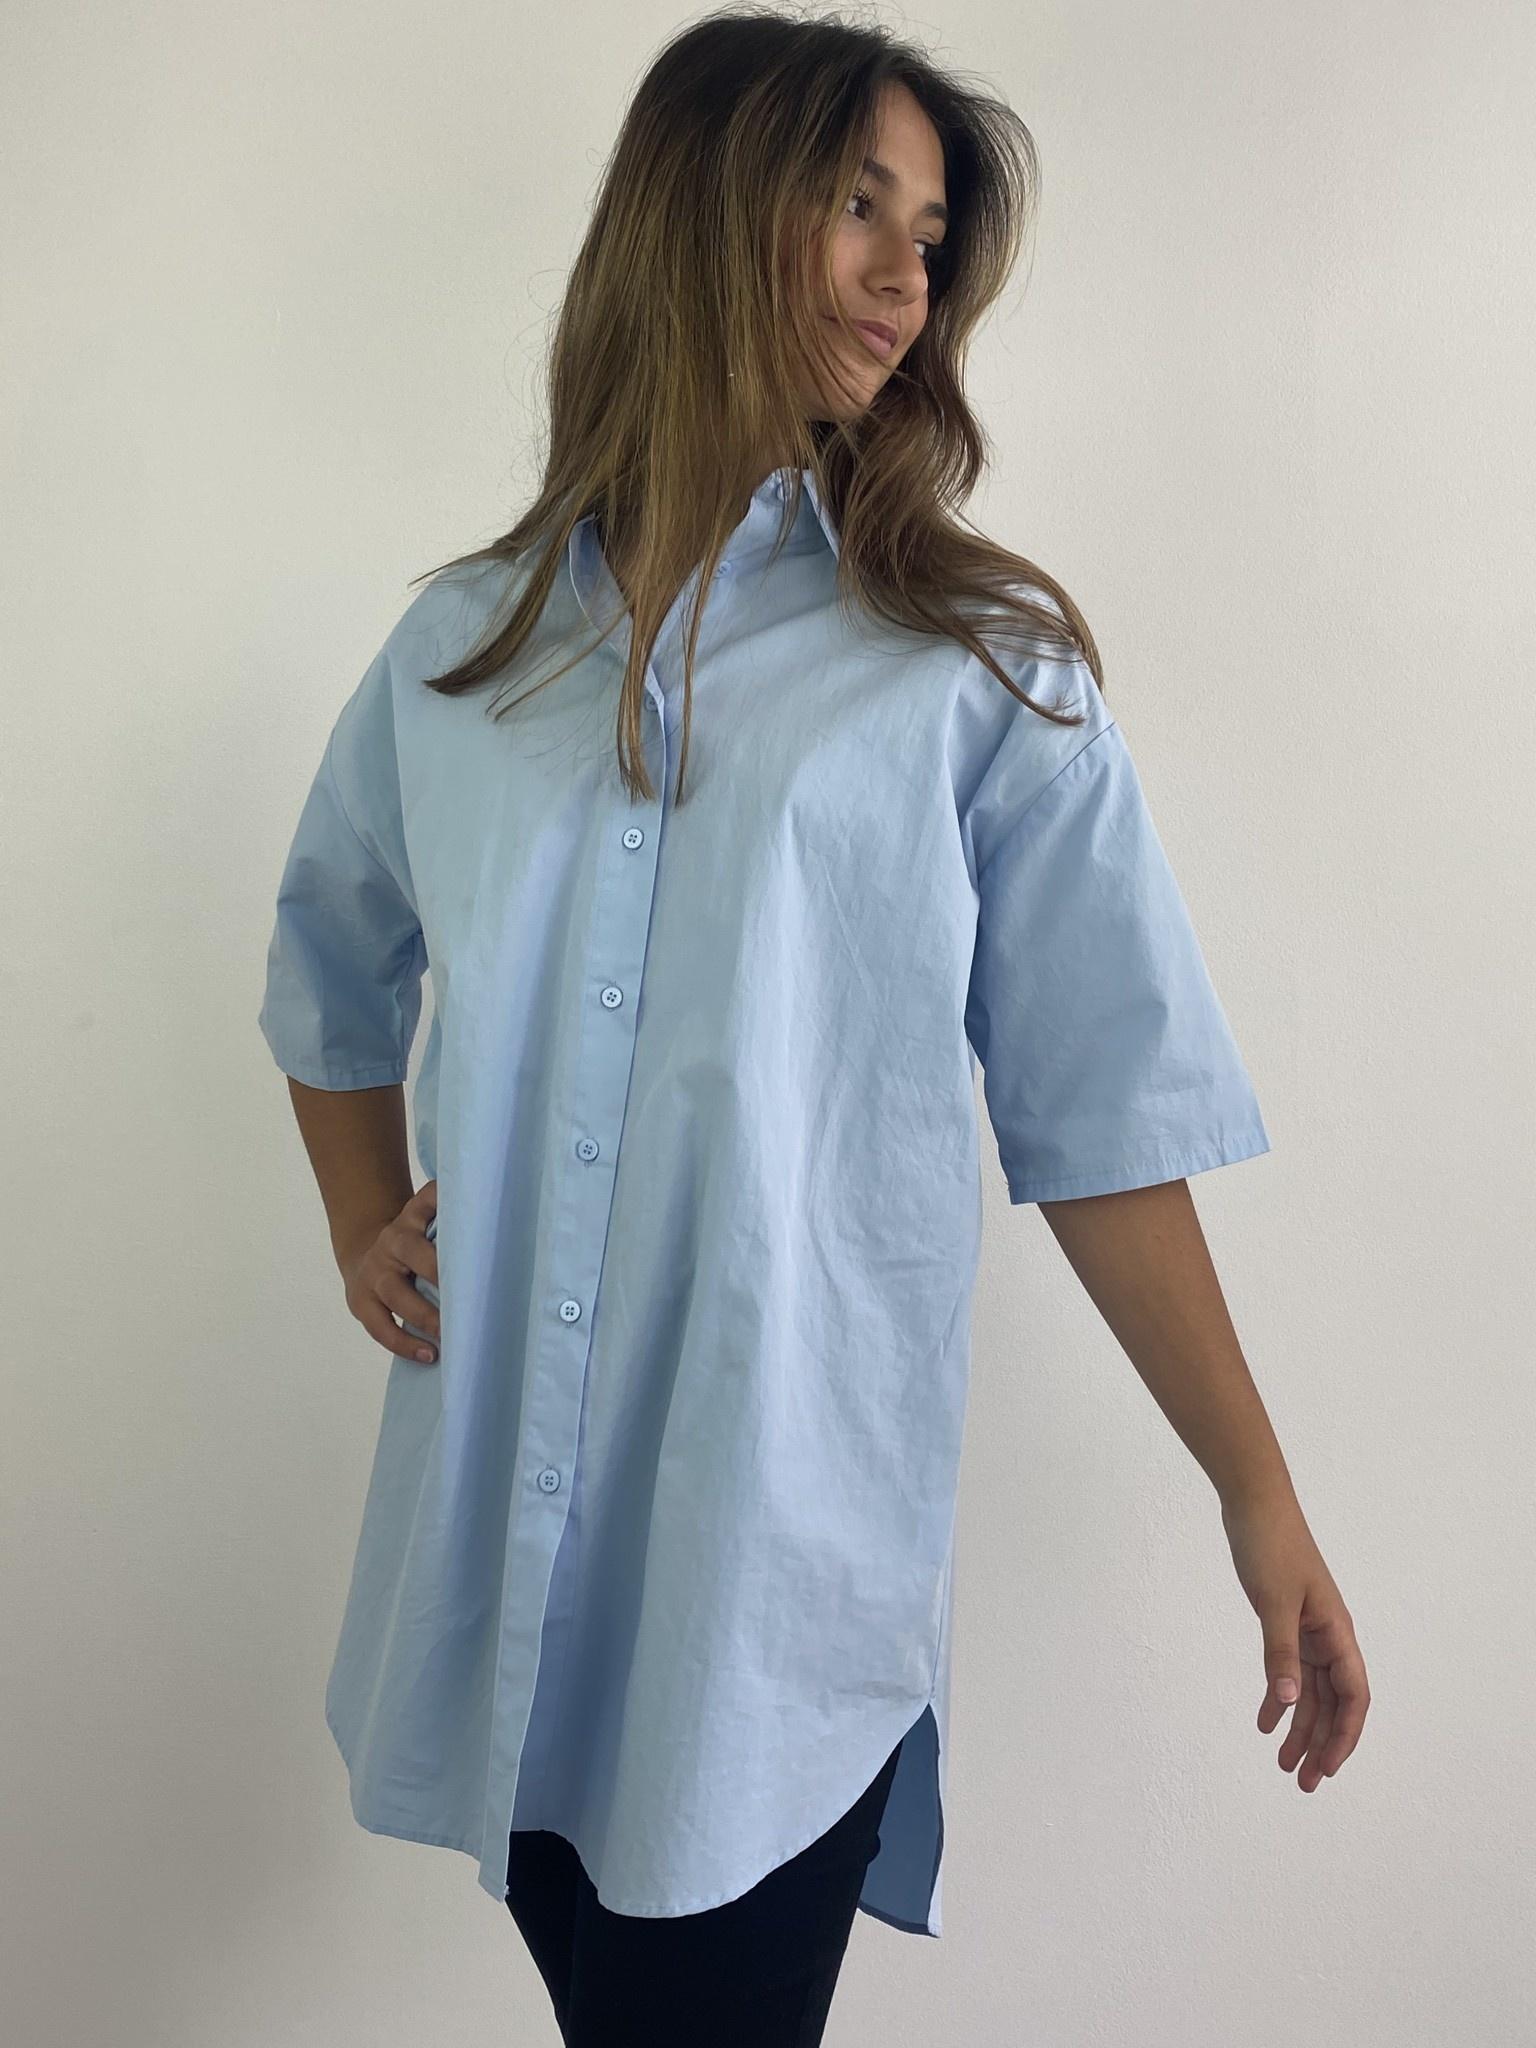 Tammy oversized shirt Light Blue-1